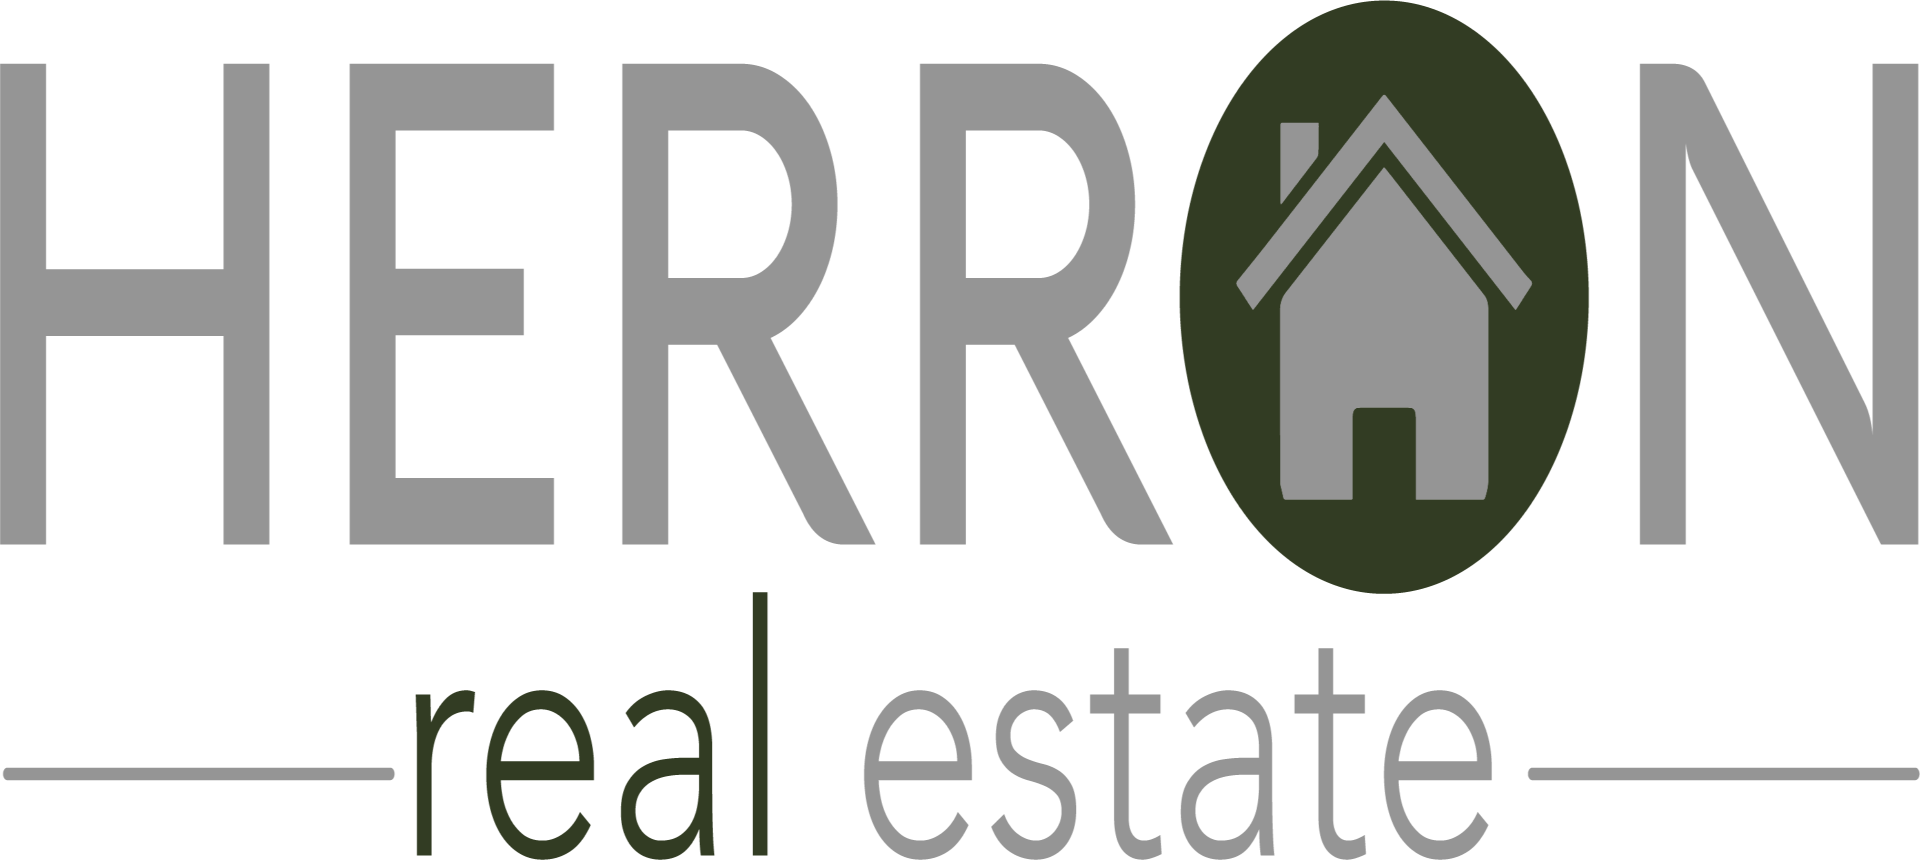 Herron Real Estate